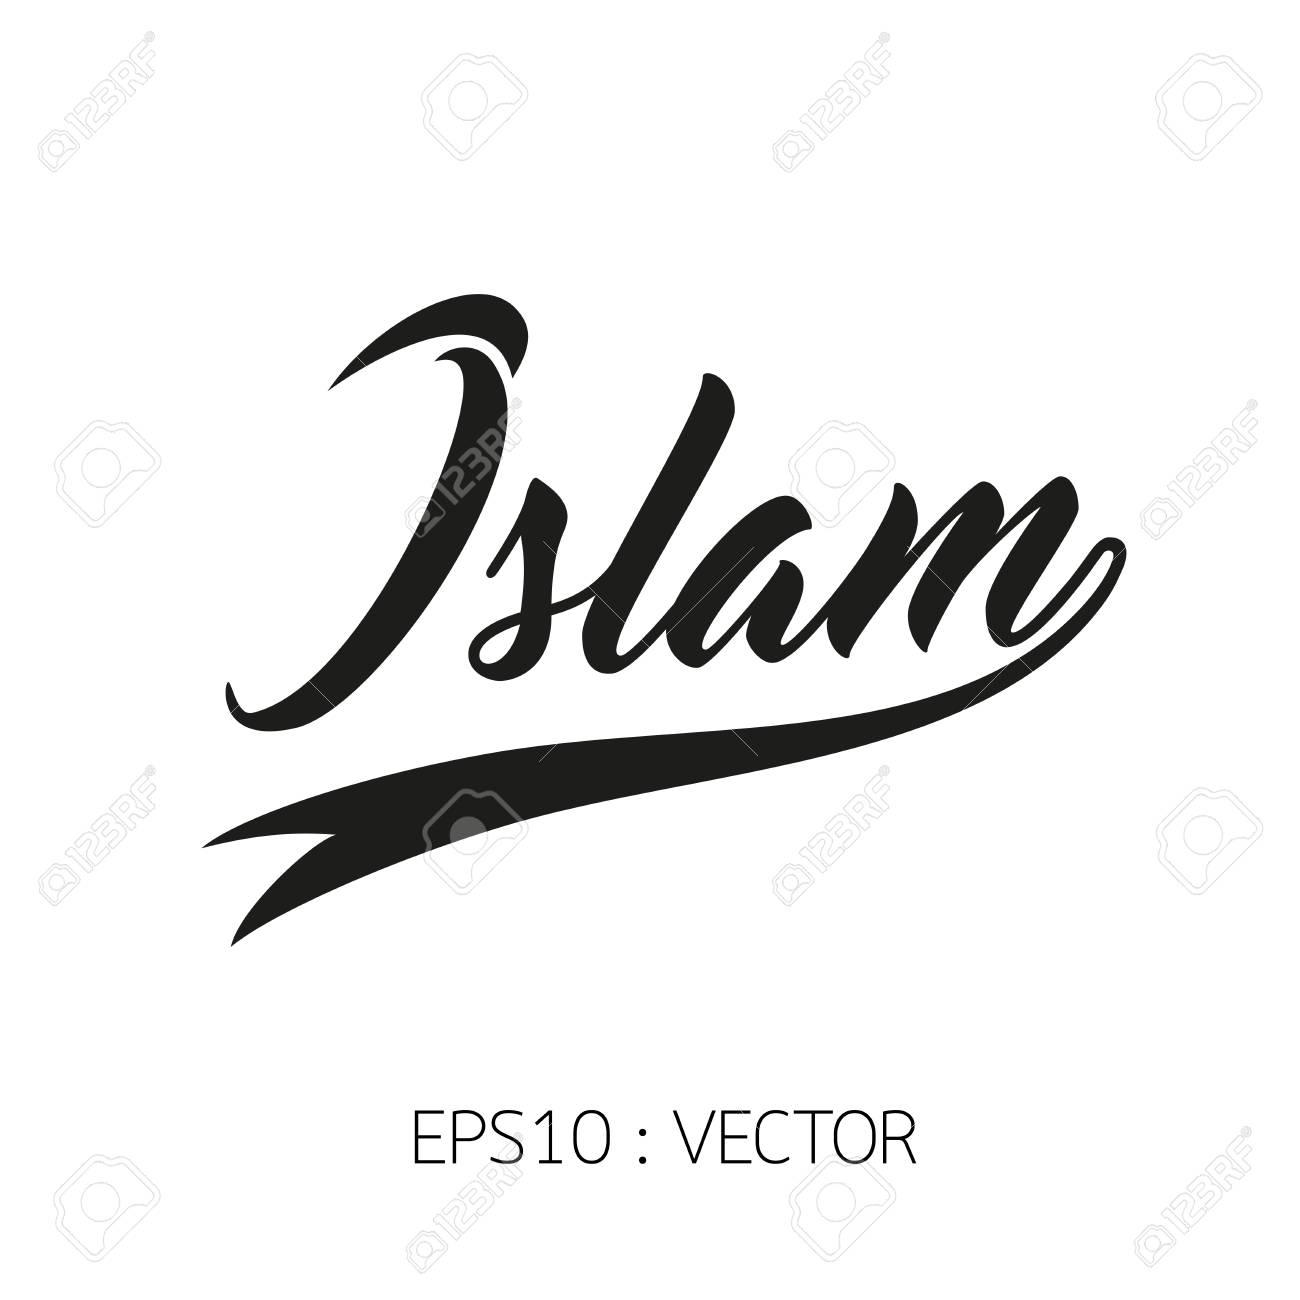 islam logo on white background royalty free cliparts vectors and rh 123rf com islamic logo islam logic